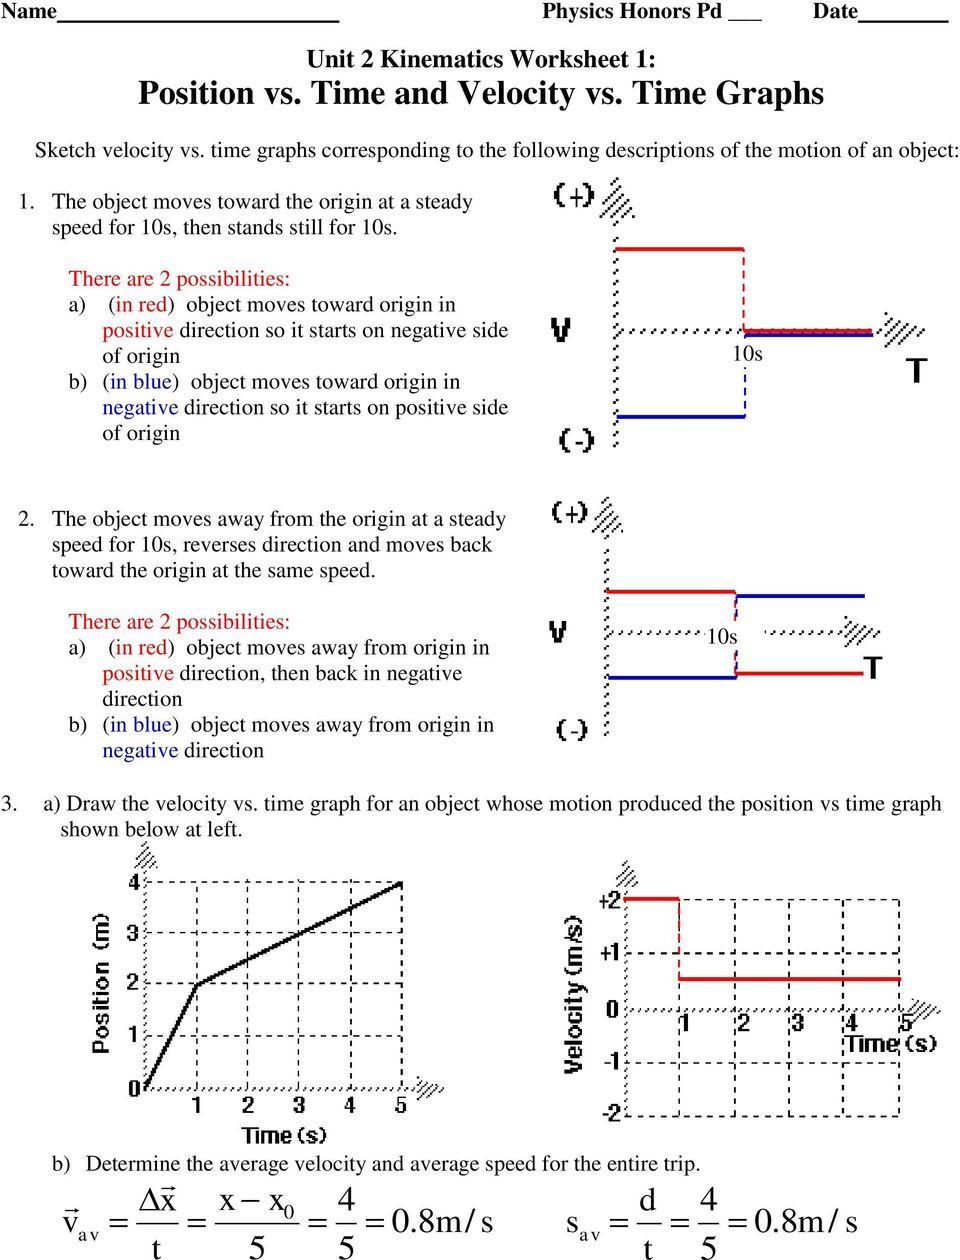 Kinematics Worksheet with Answers Kinematics Worksheet 1 Answers Worksheet List